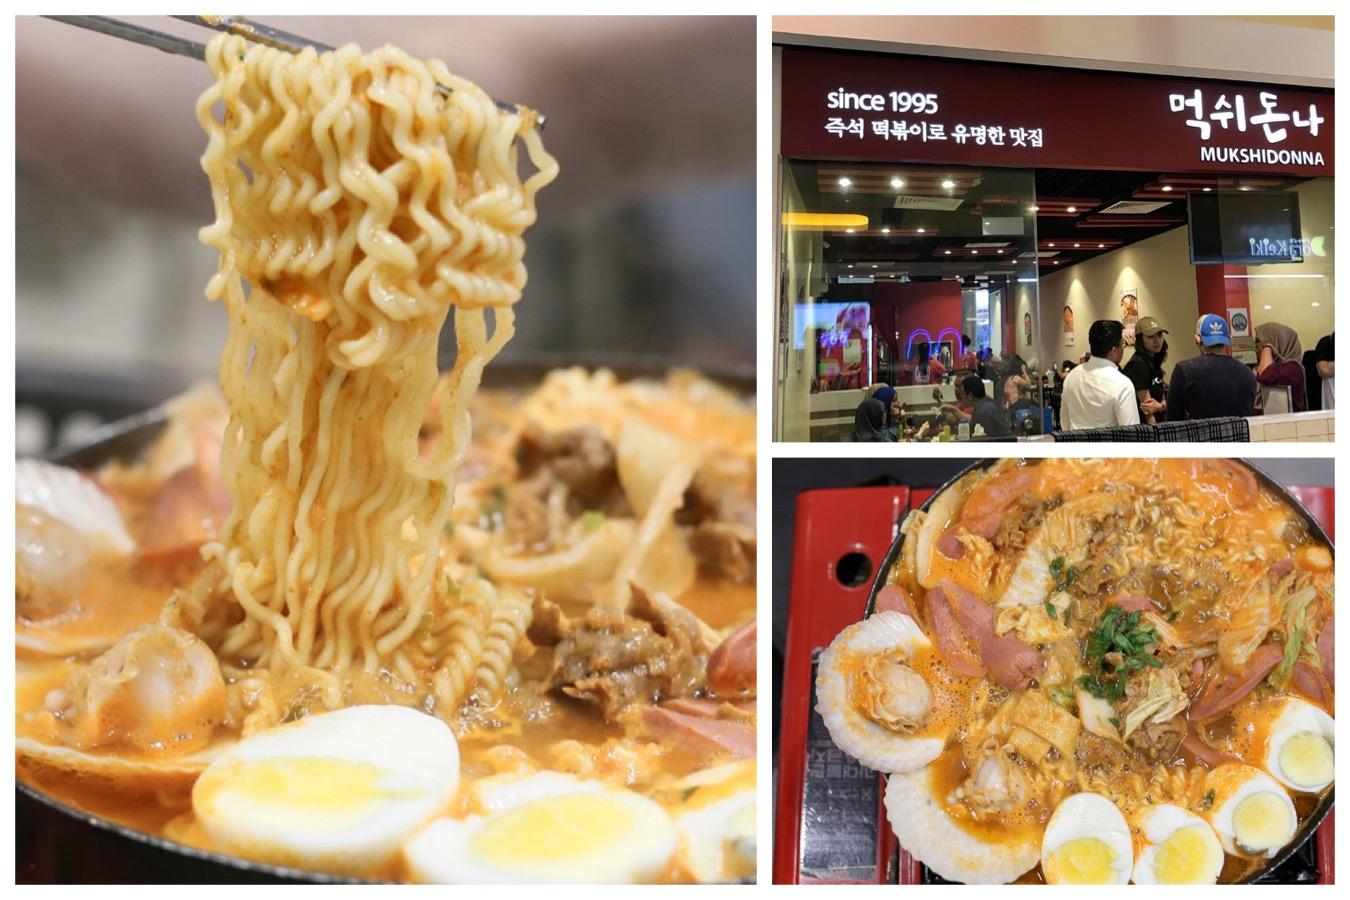 Mukshidonna Singapore Halal Korean Restaurant For Army Stew Toppoki At Pasir Ris Downtown East Danielfooddiary Com